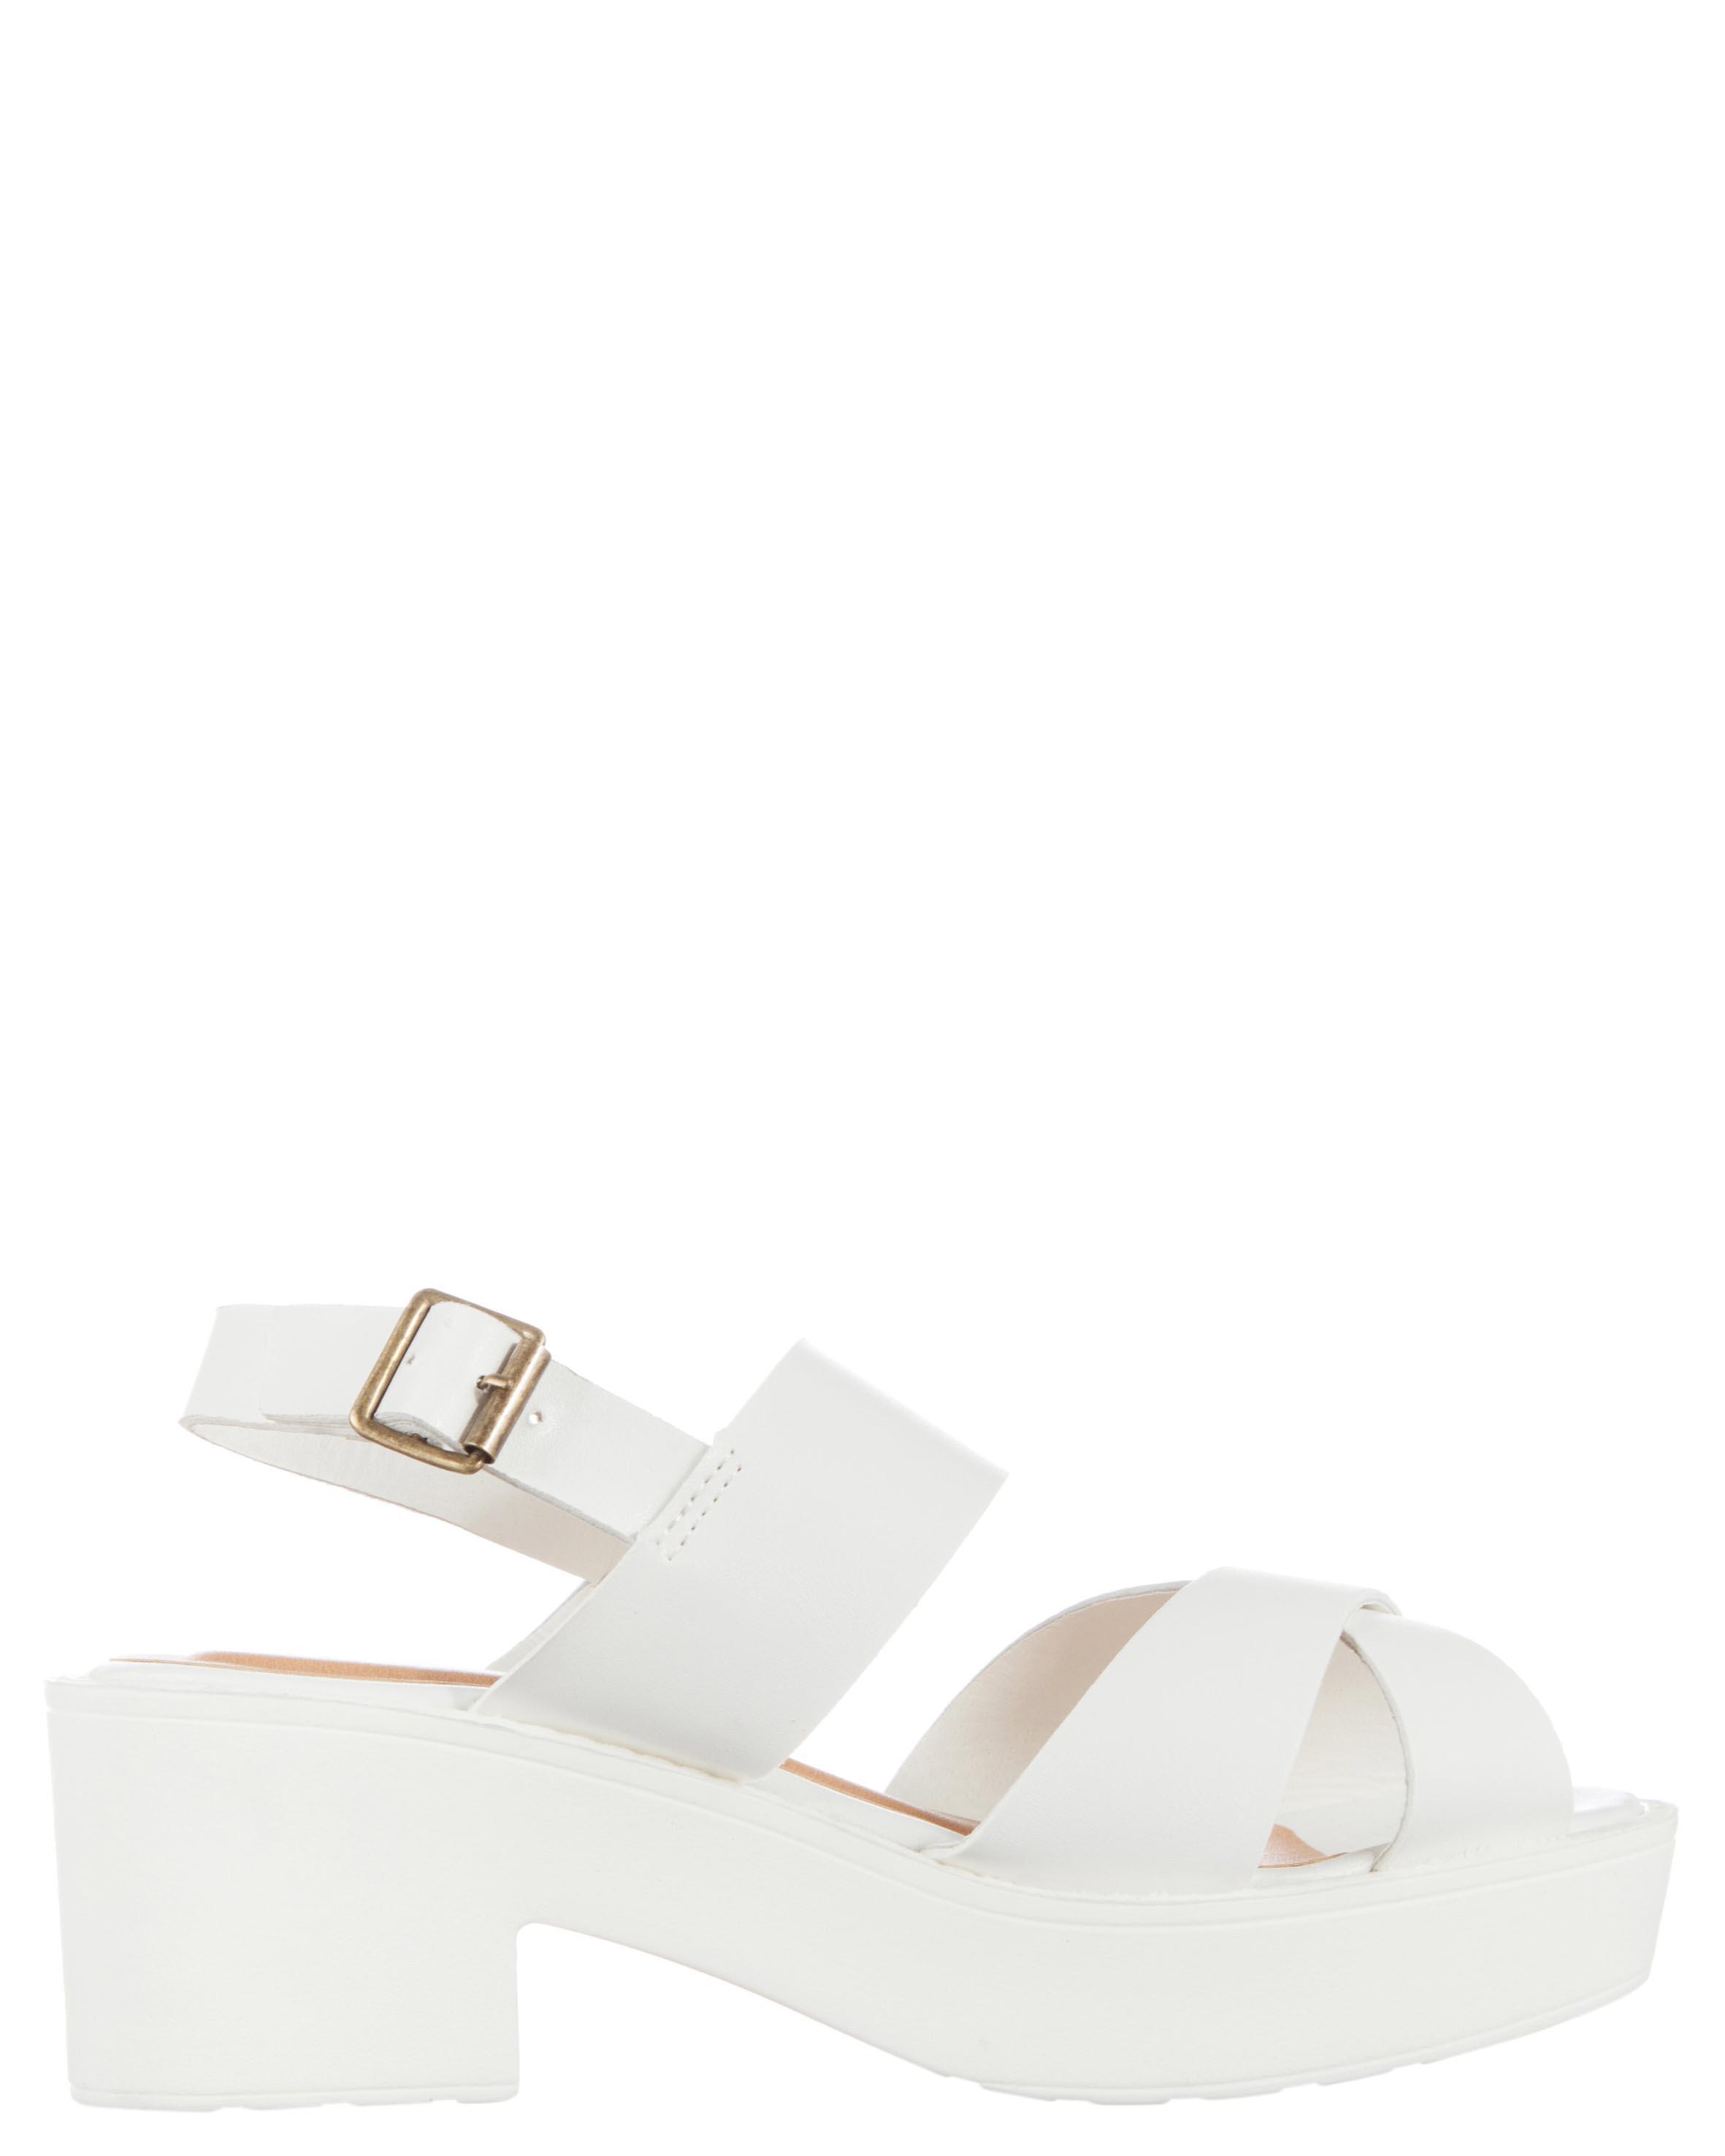 White sandals rubi shoes - Shoes 5 Polyvore